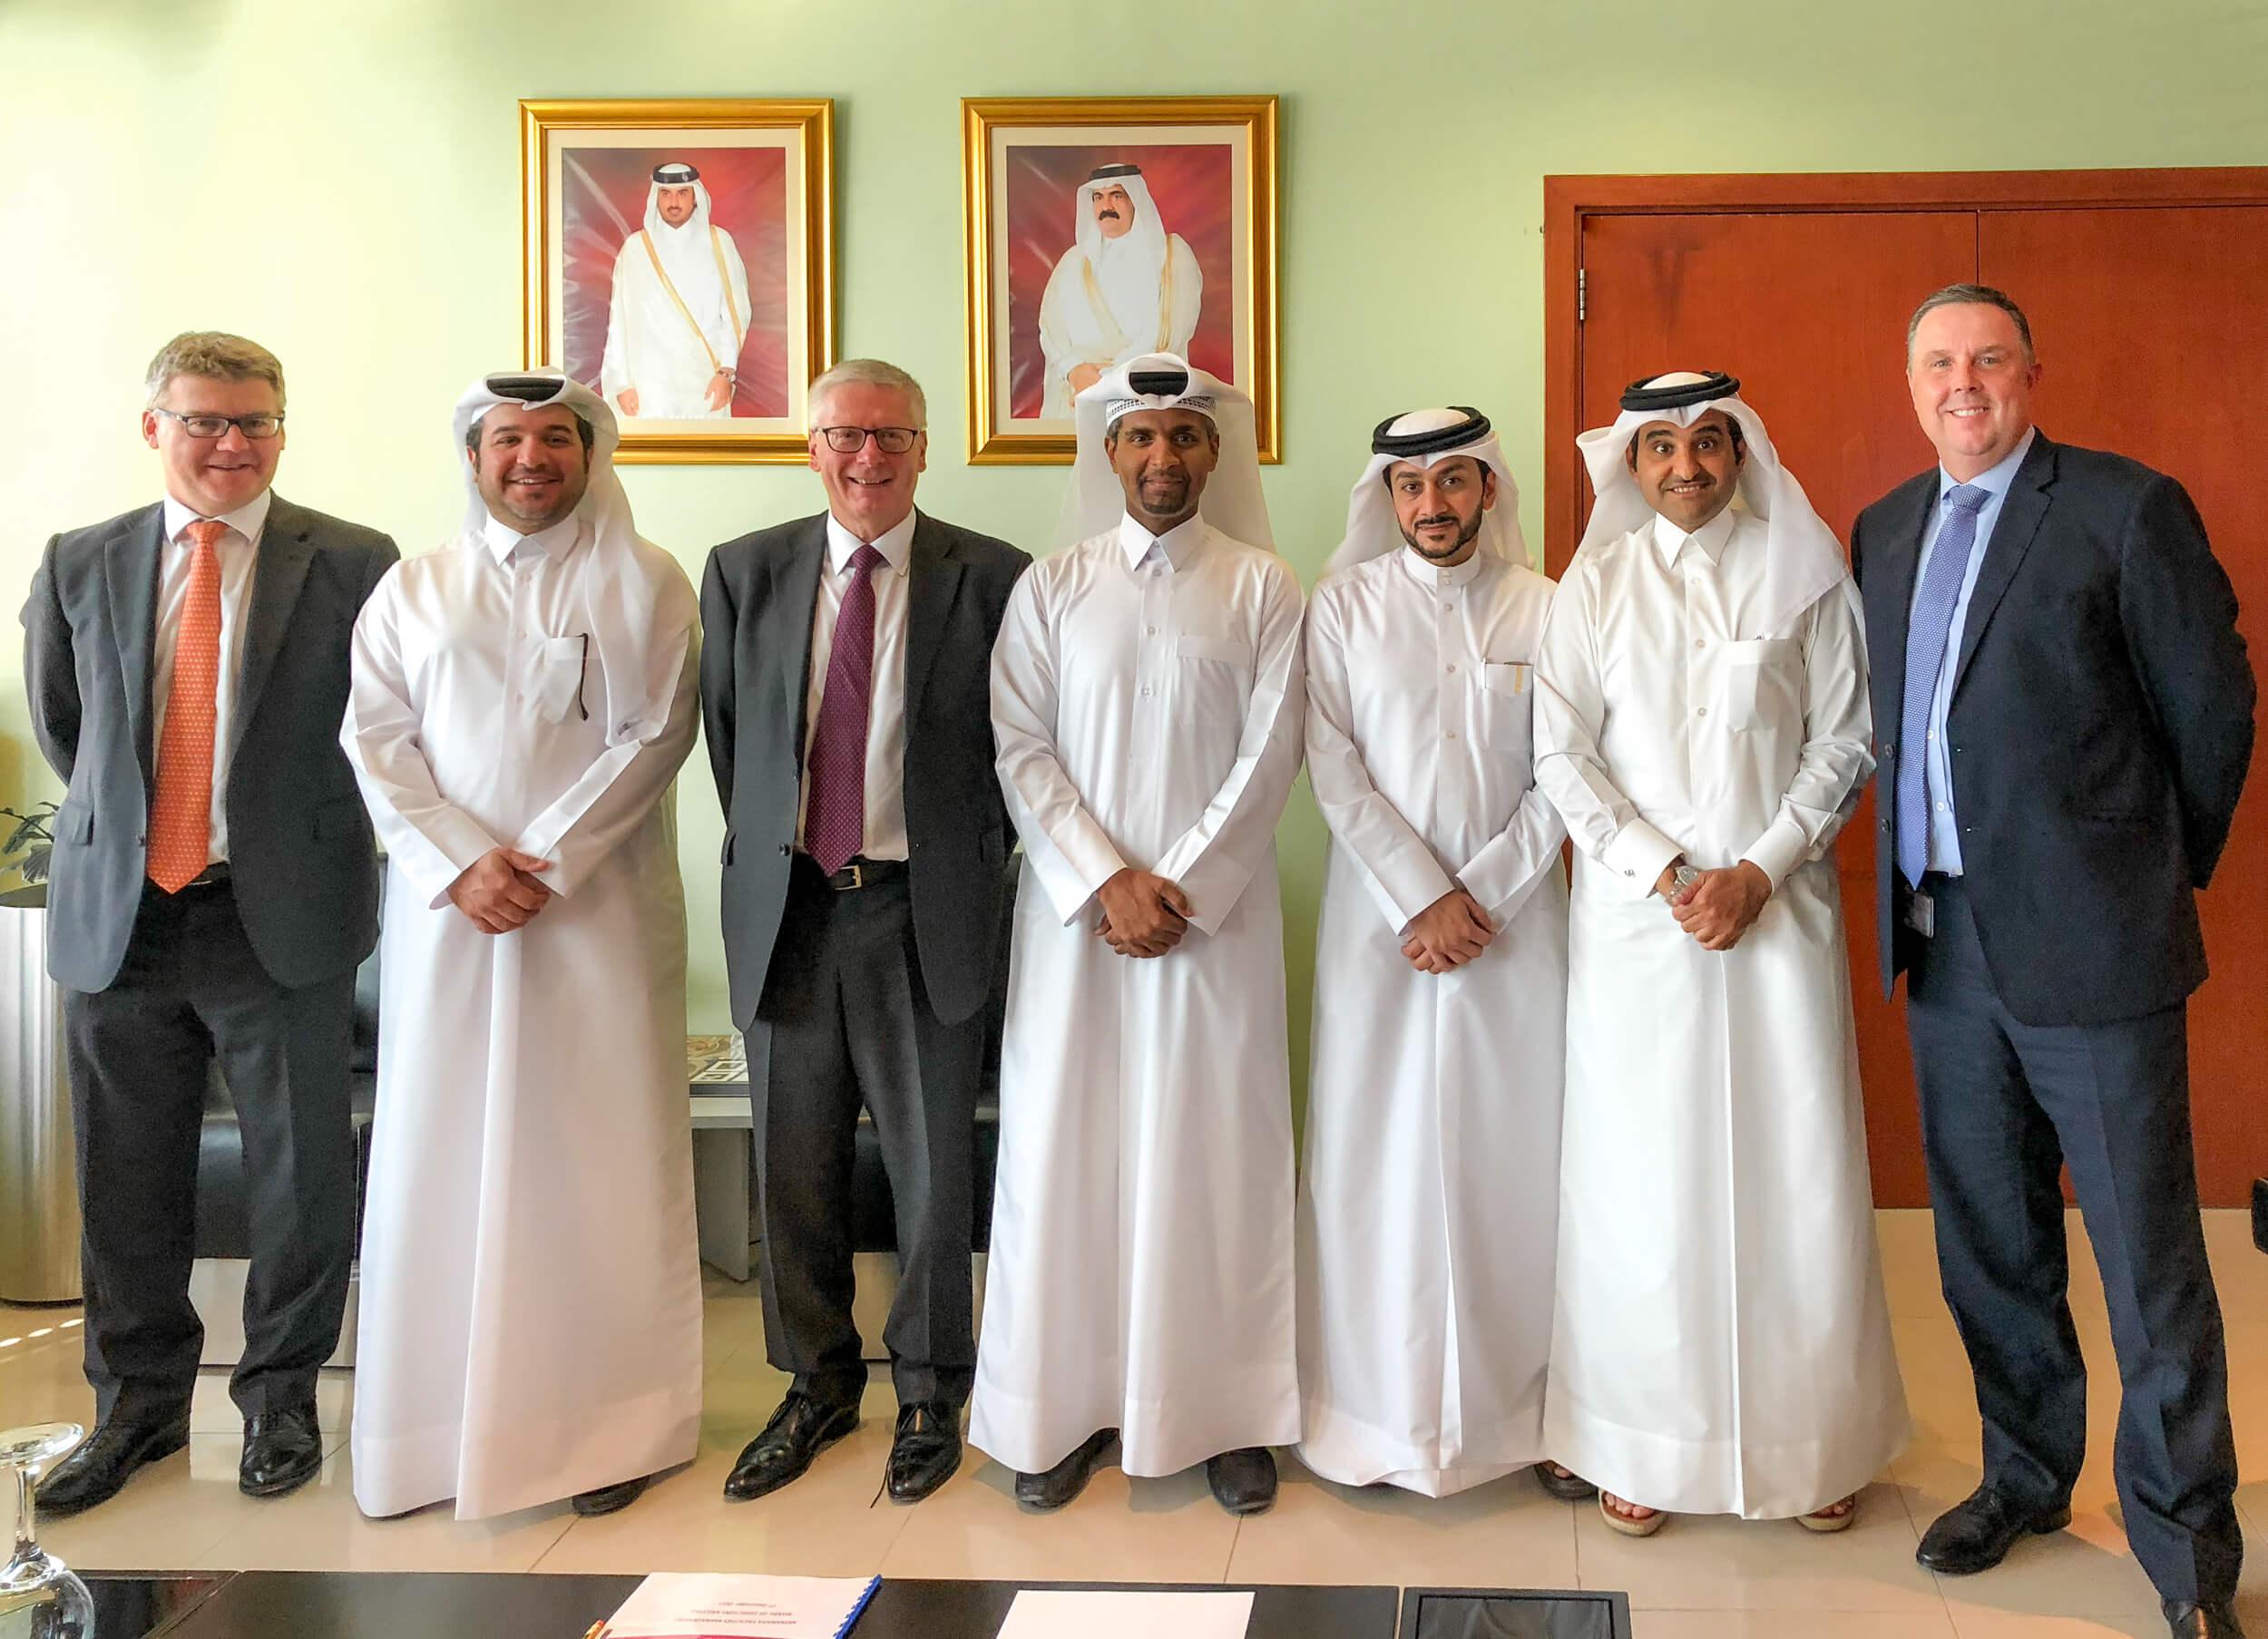 Left to Right: Ian Thomas, Ahmad Al Mulla, Steve Watts, Abdulaziz Al Mahmoud, Ibrahim Al Darwish, Khalid Al Mohannadi, Mark Cooke